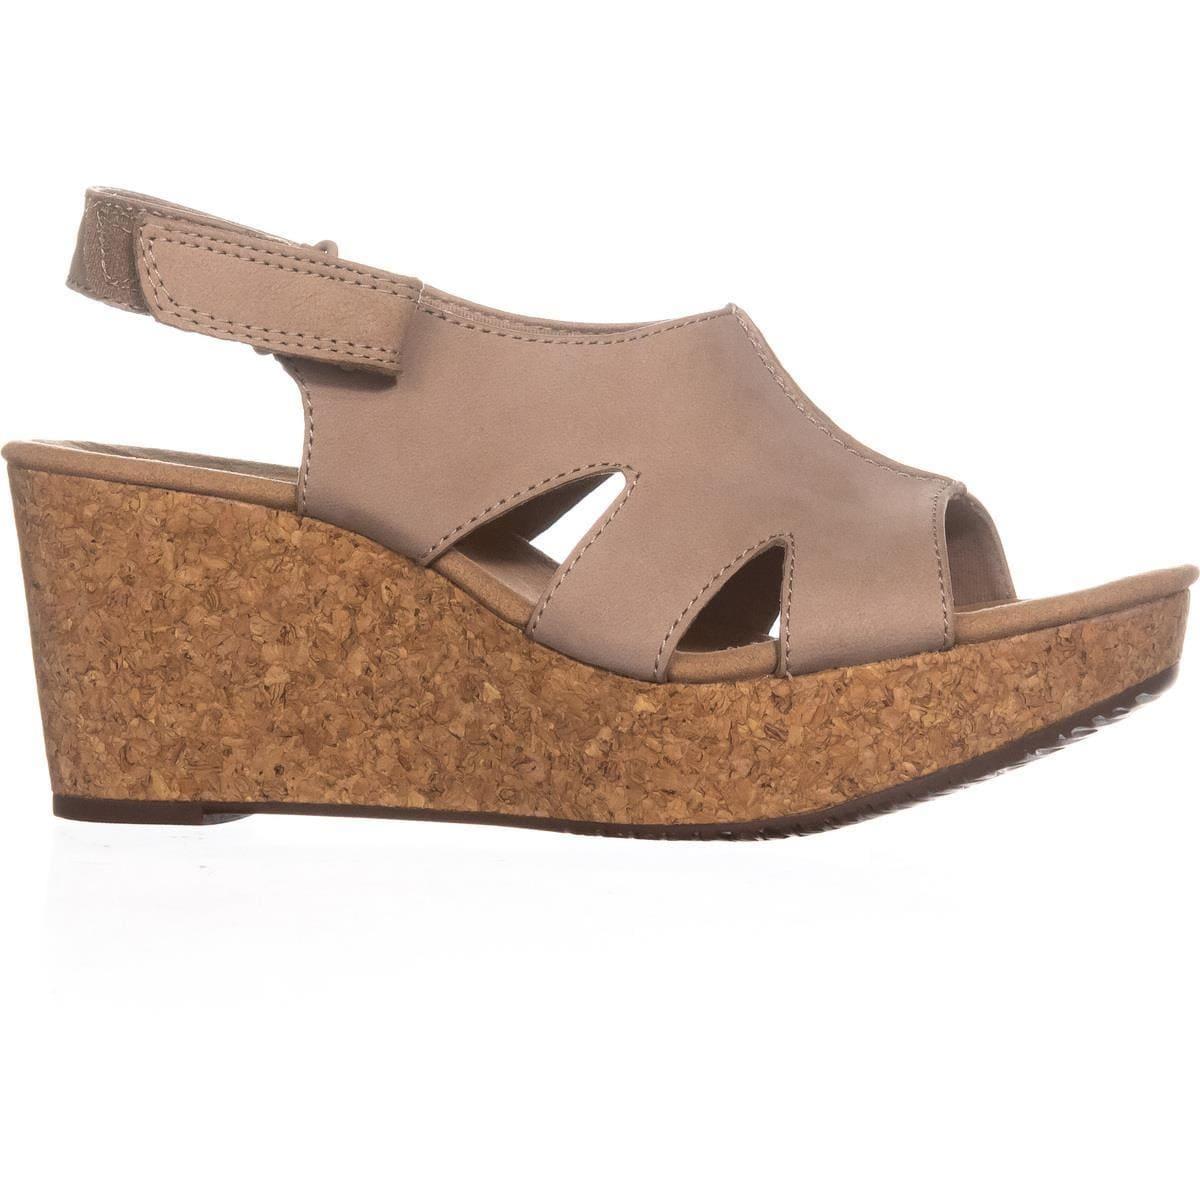 e163323421d Shop Clarks Annadel Bari Platform Wedge Sandals